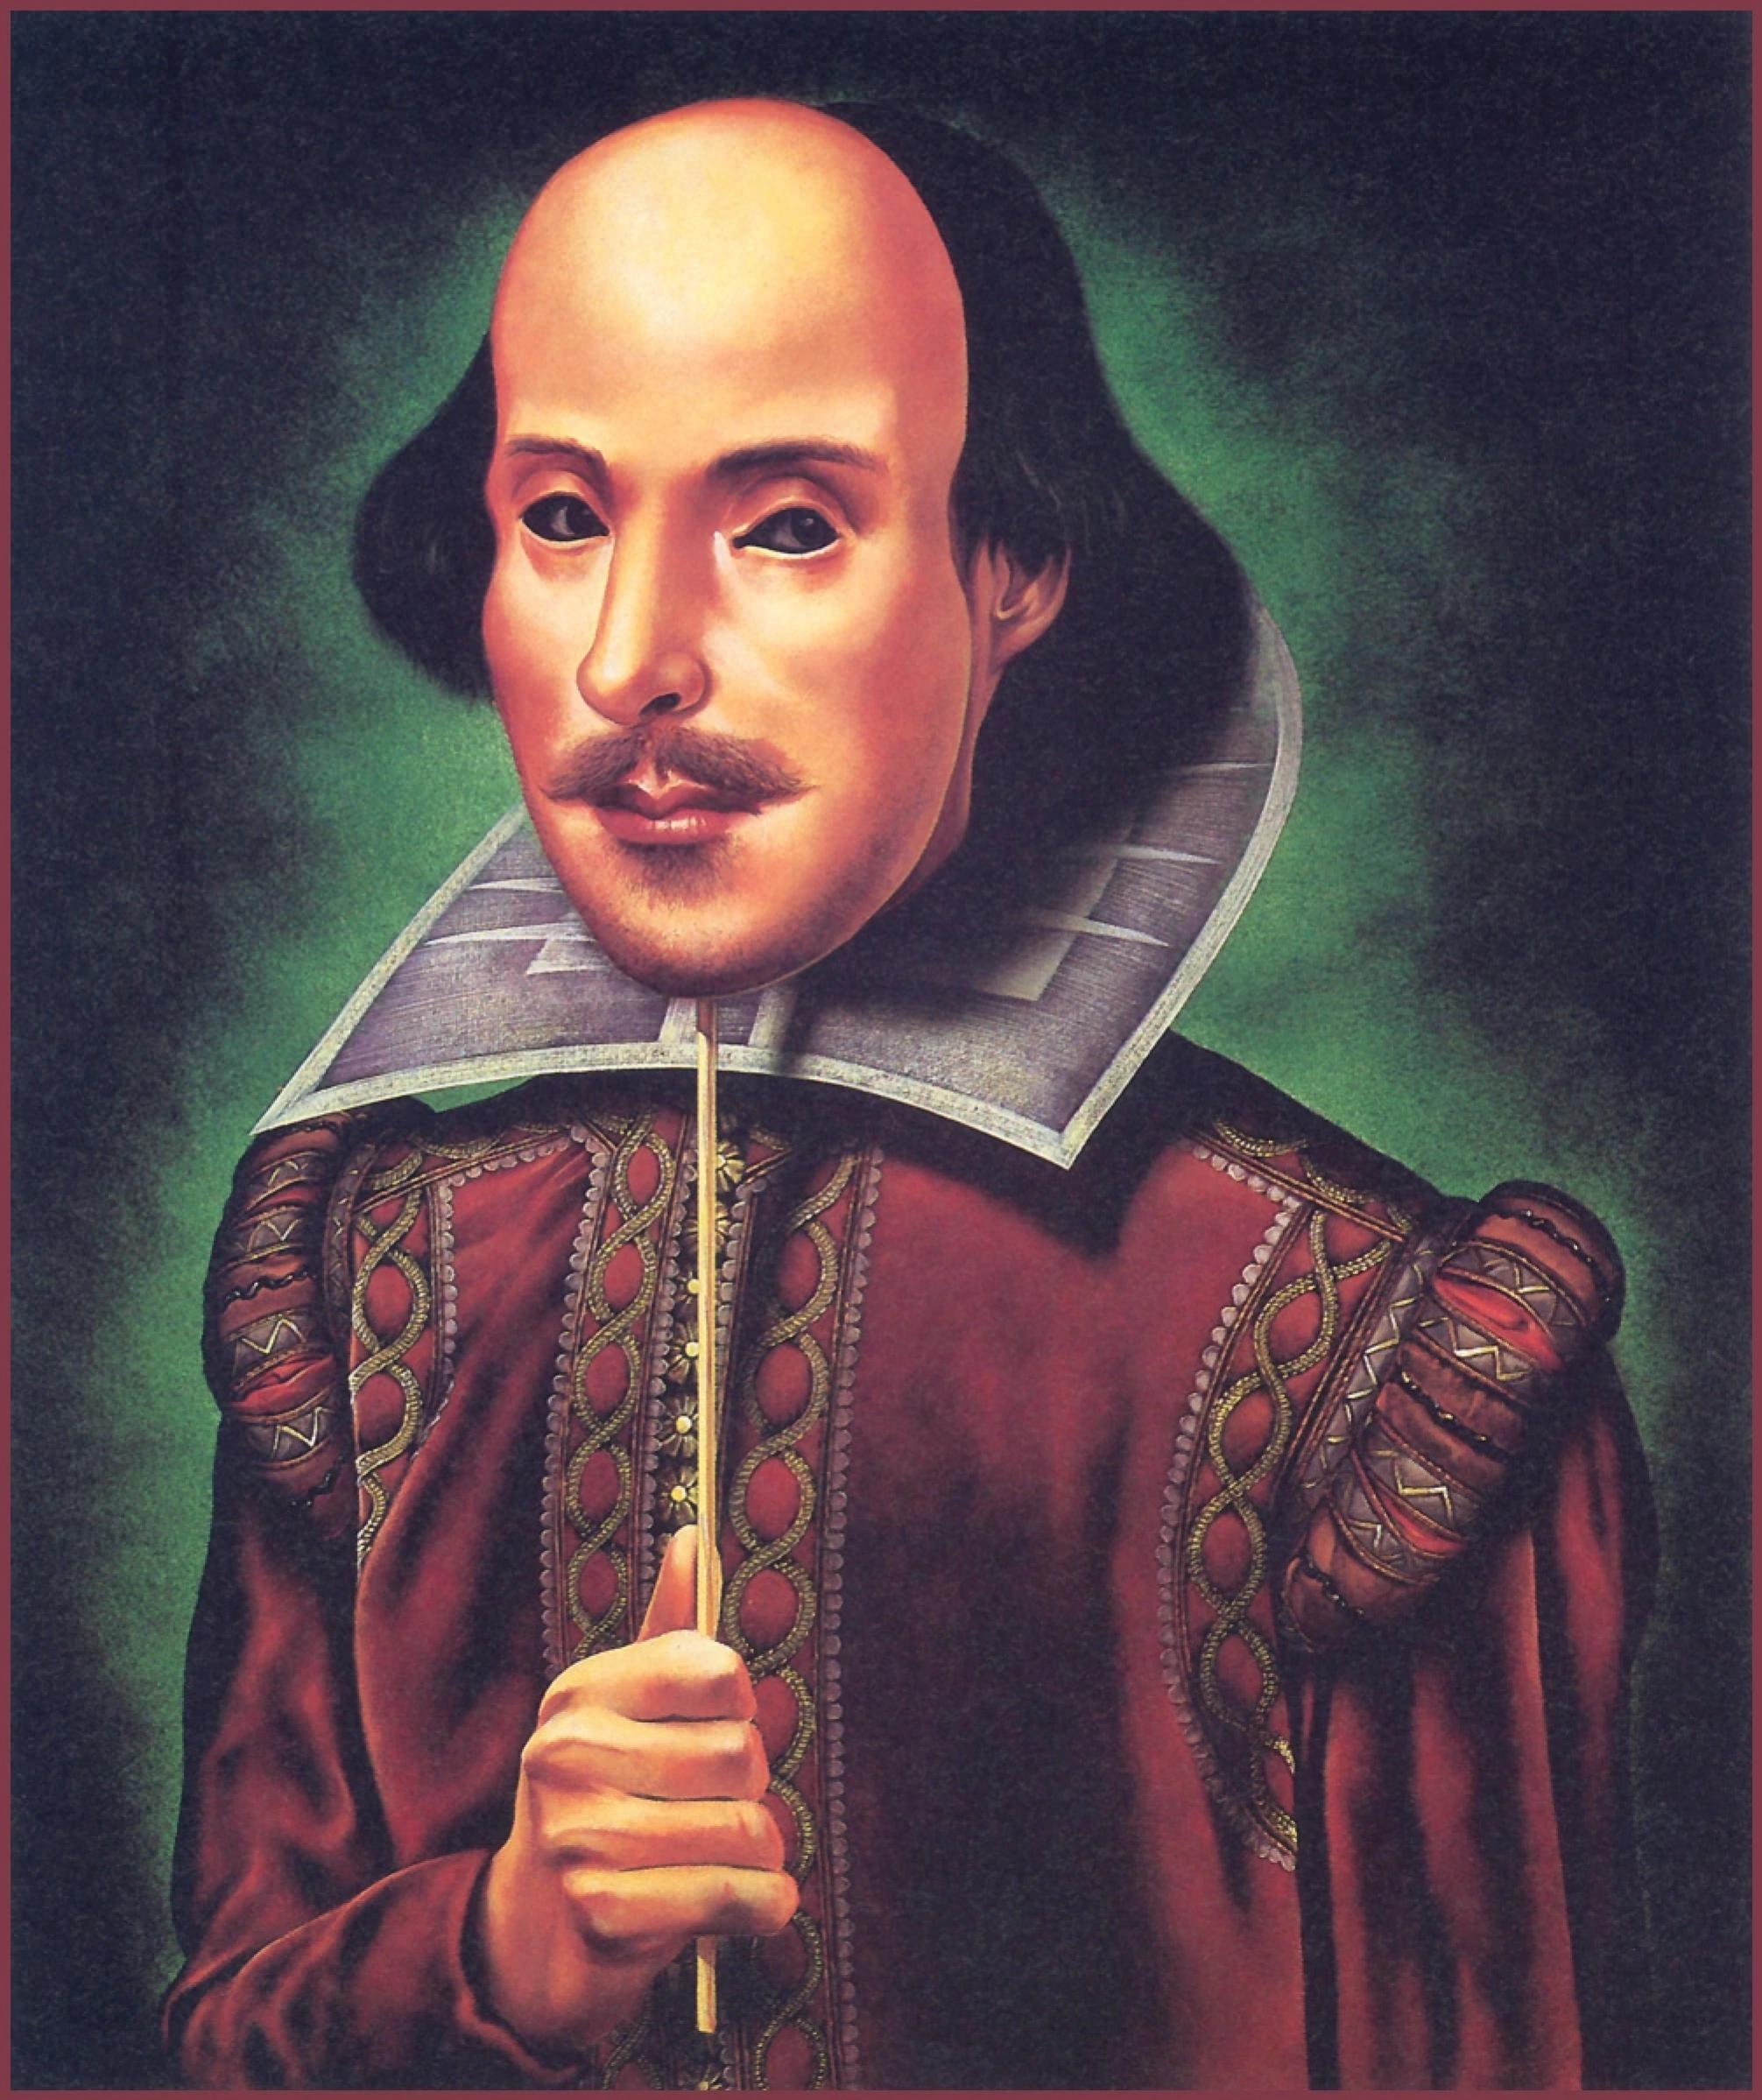 Марк Харрисон «Таинственный Шекспир»